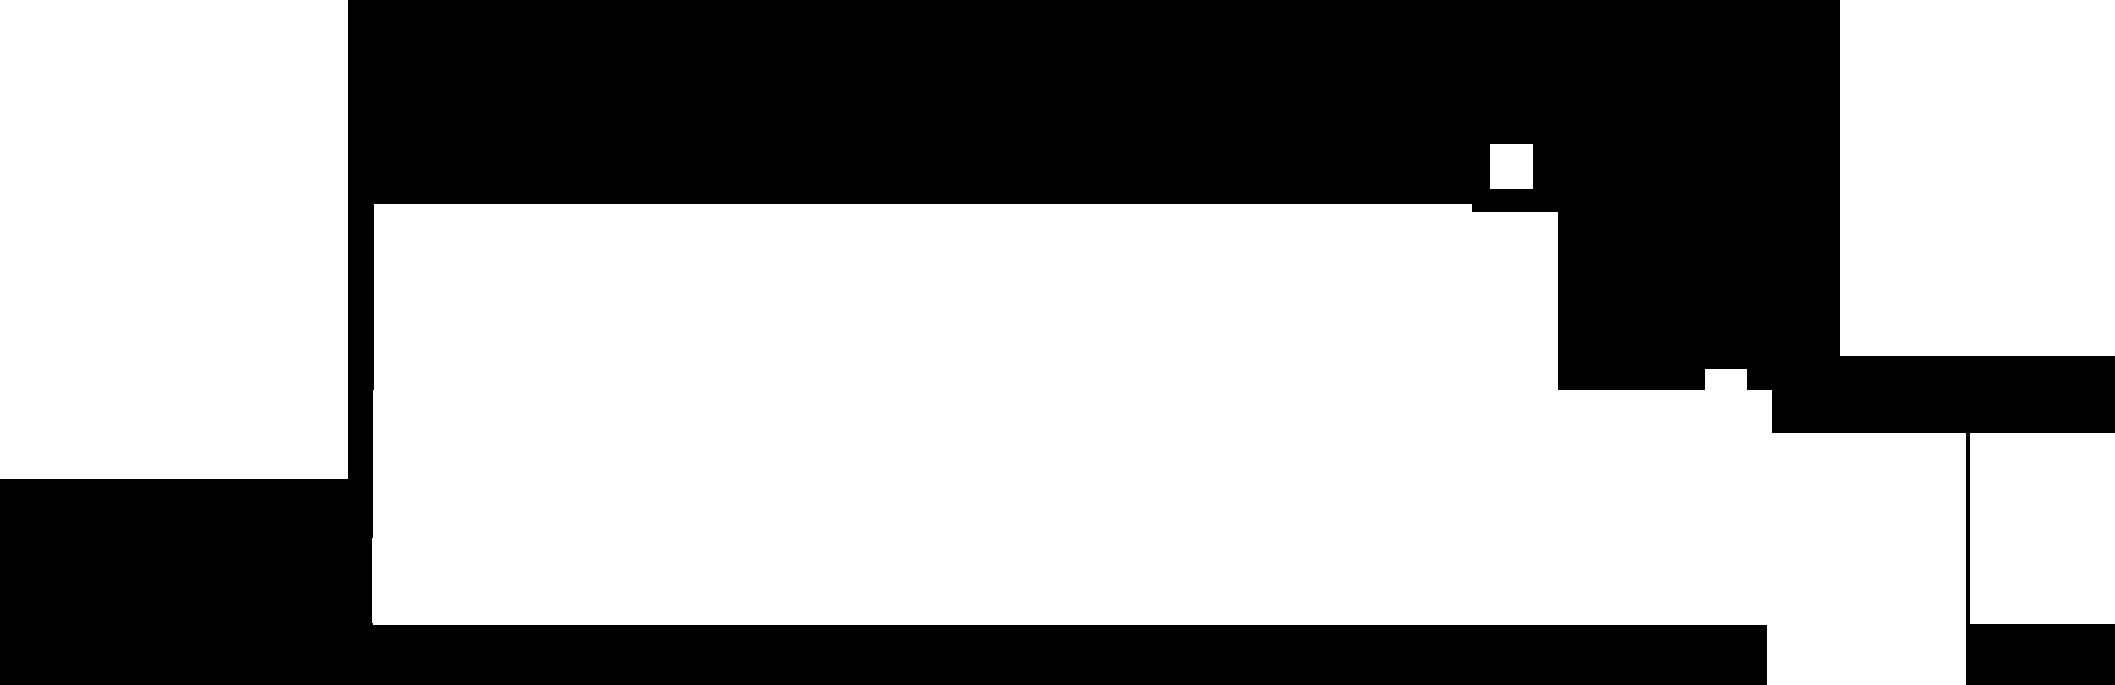 La newsletter Economitips